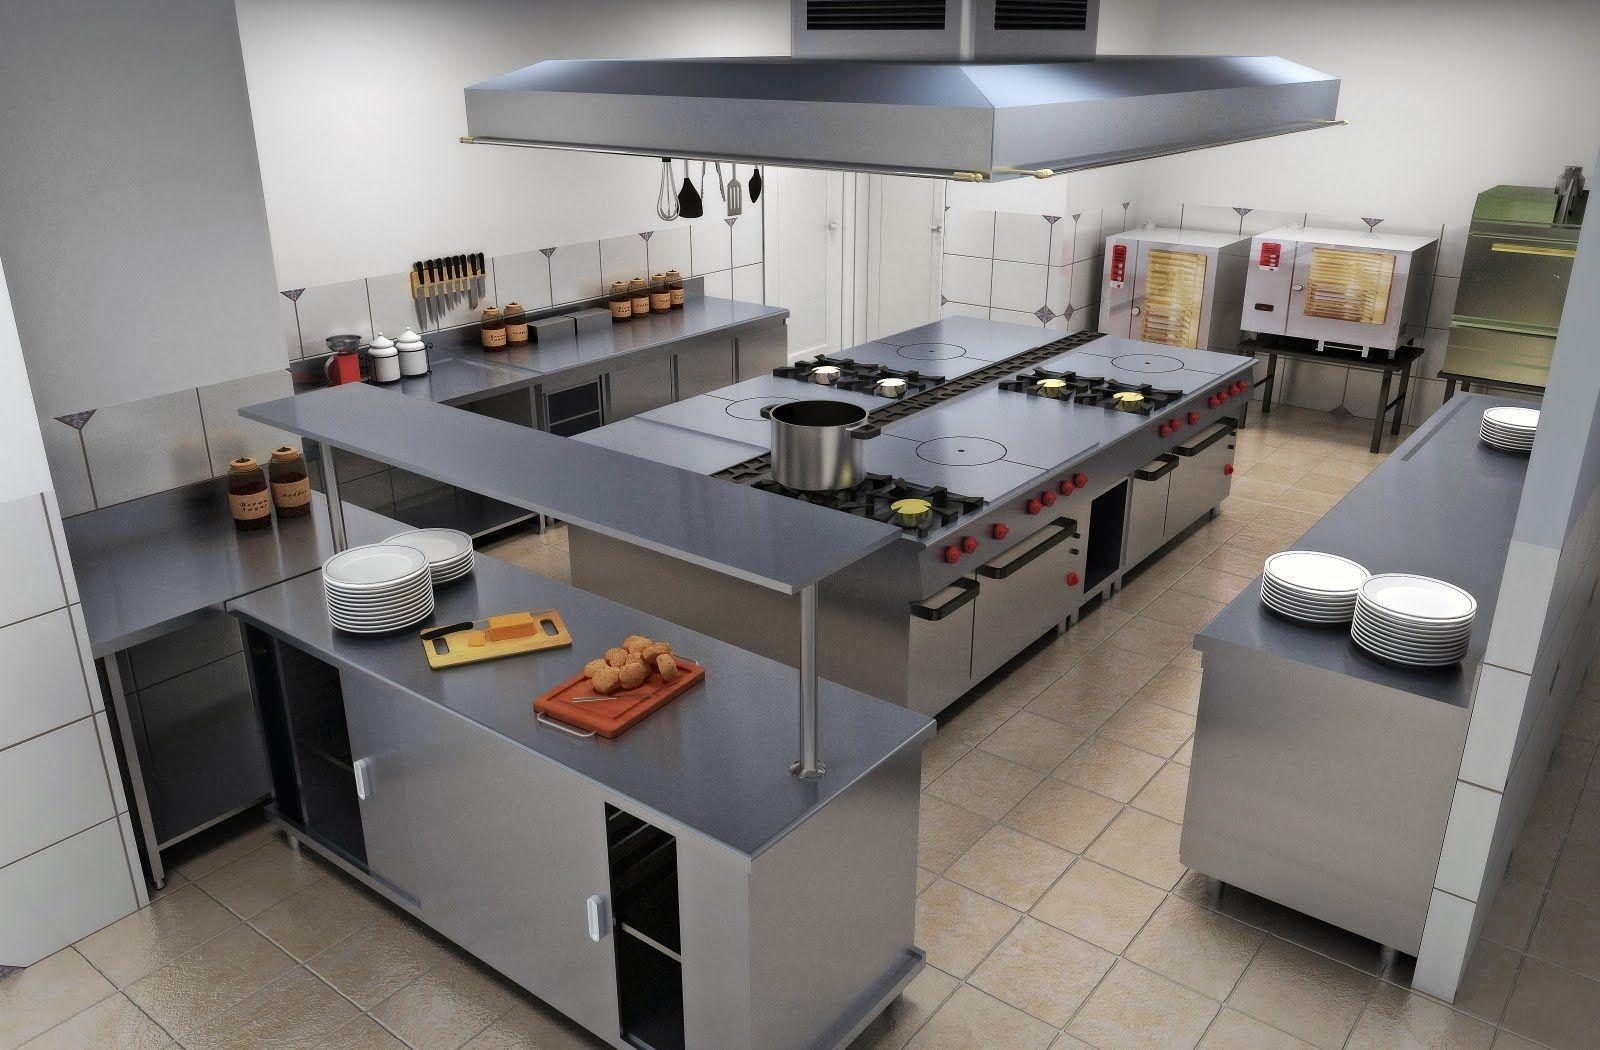 Imagenes de cocinas para restaurantes de b squeda for Plancha para restaurante segunda mano